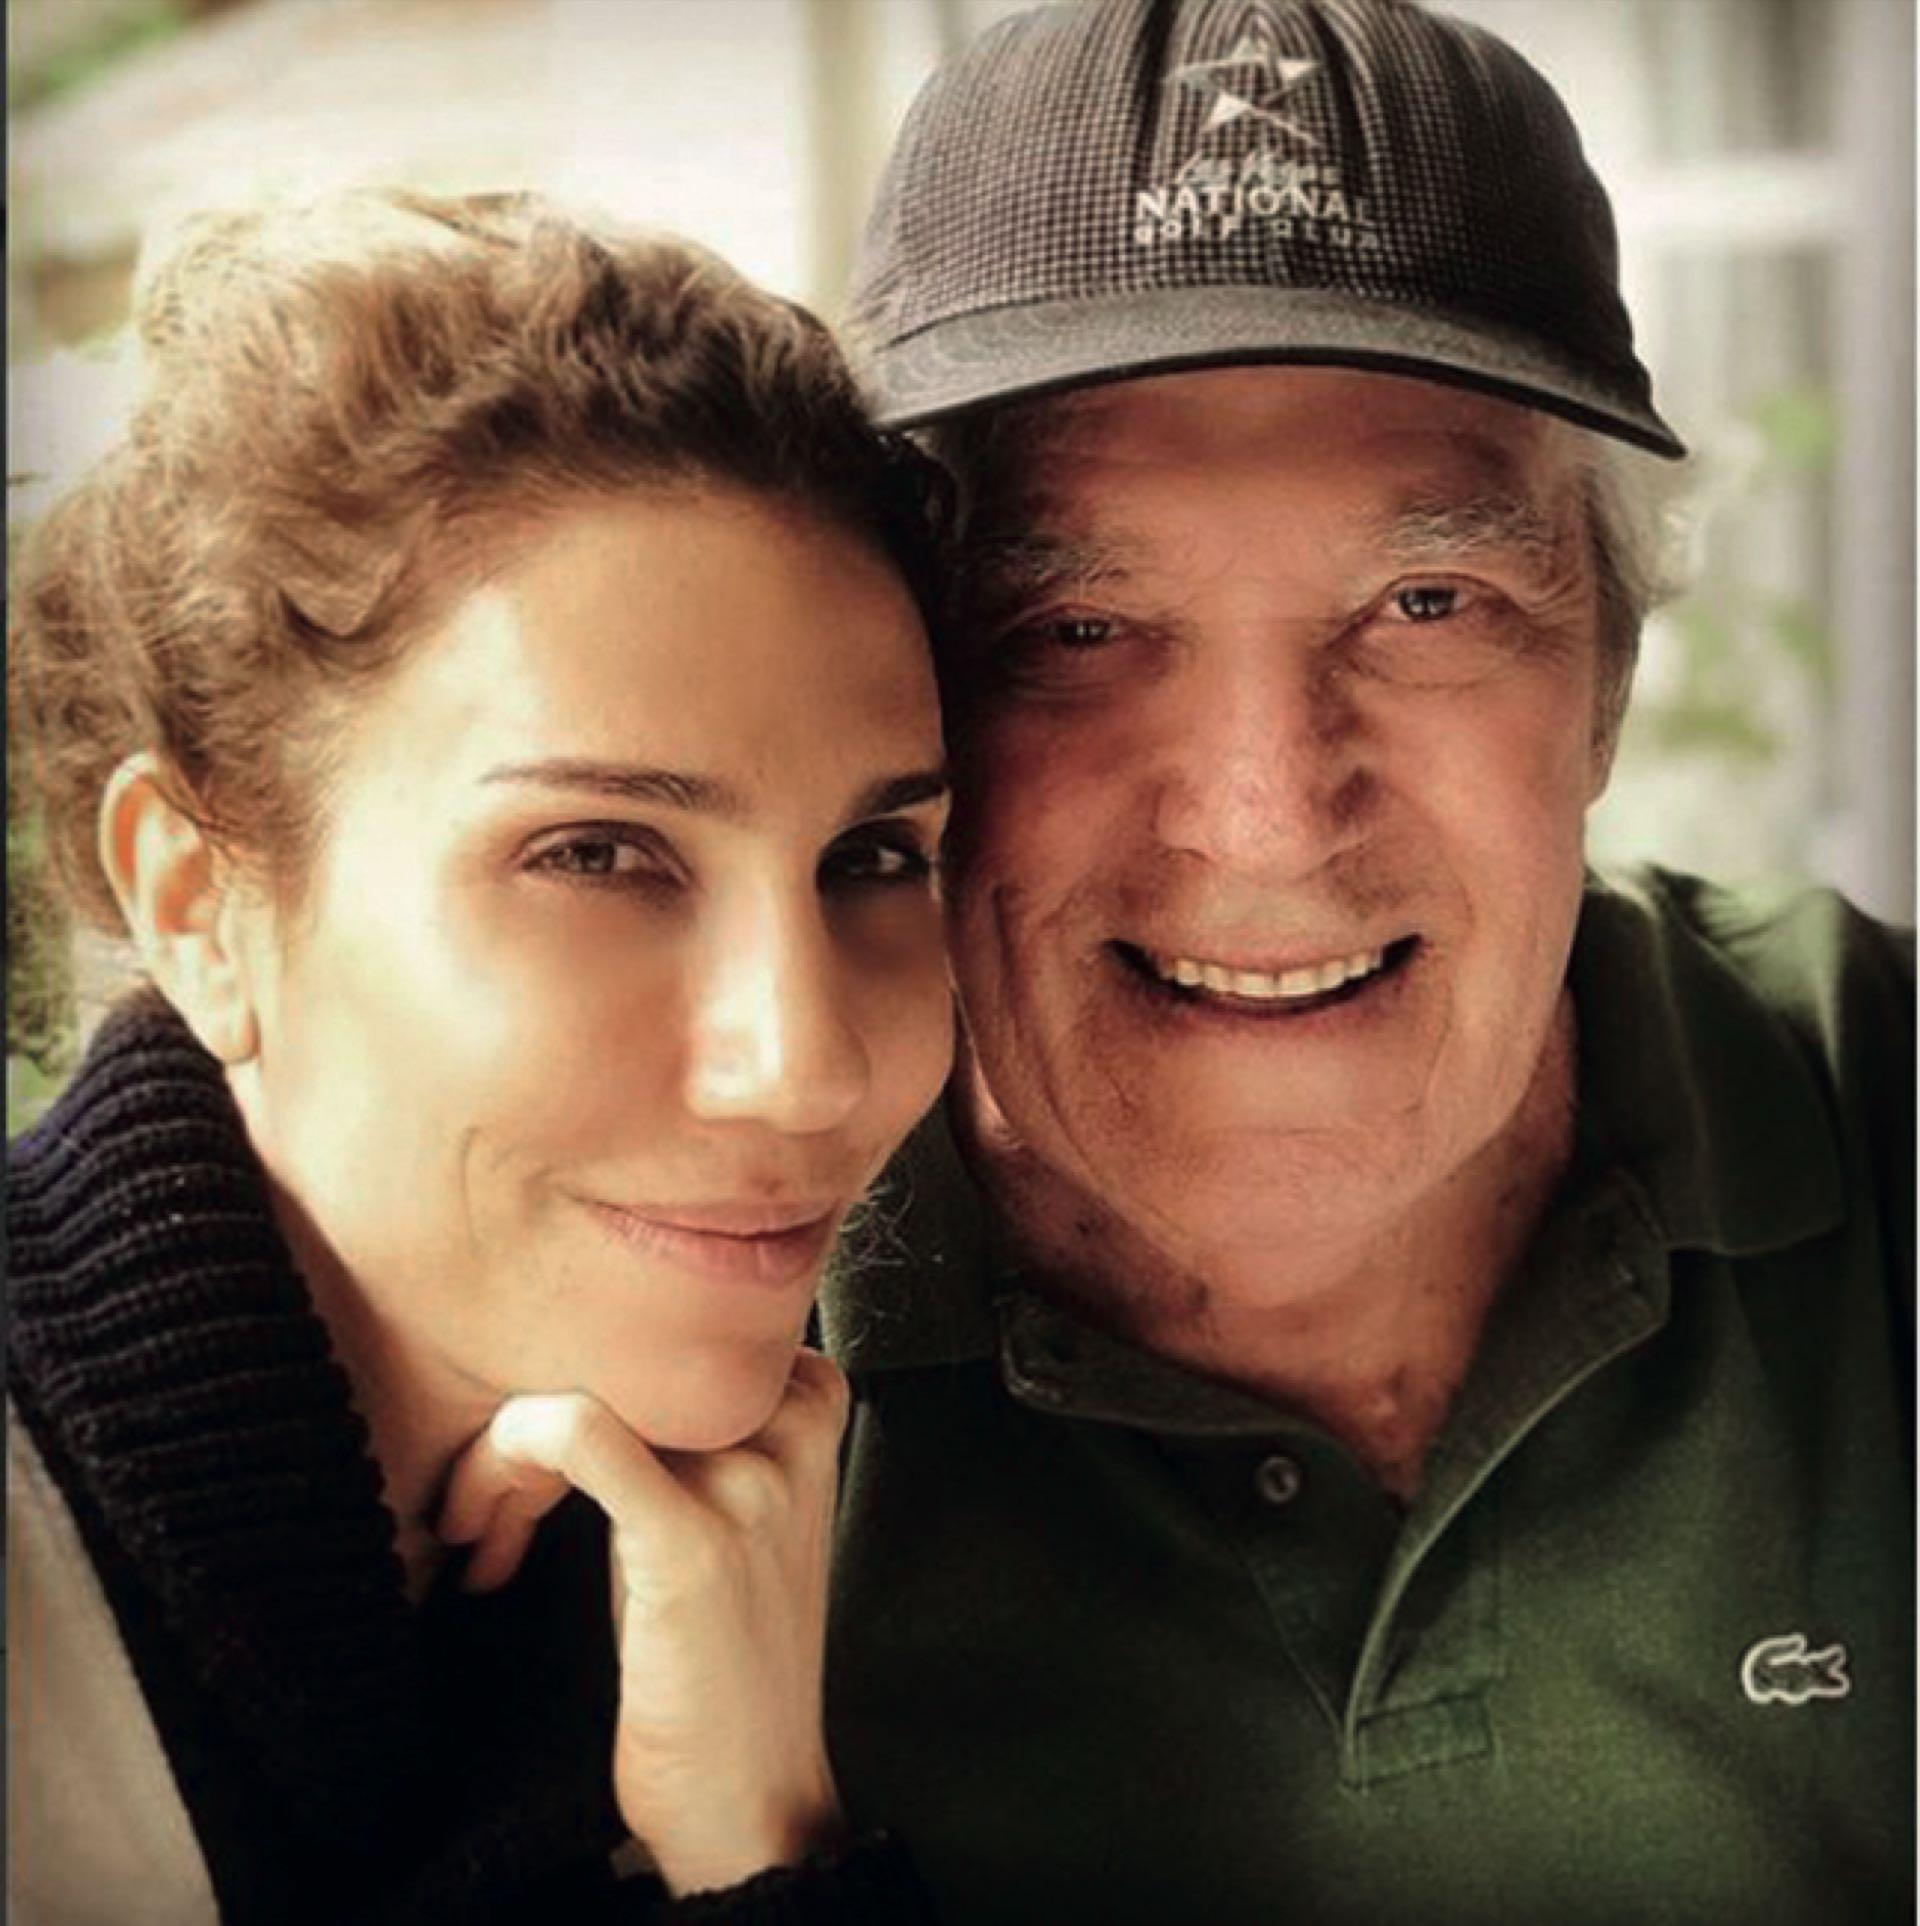 Julieta con su papá, Chico Novarro.